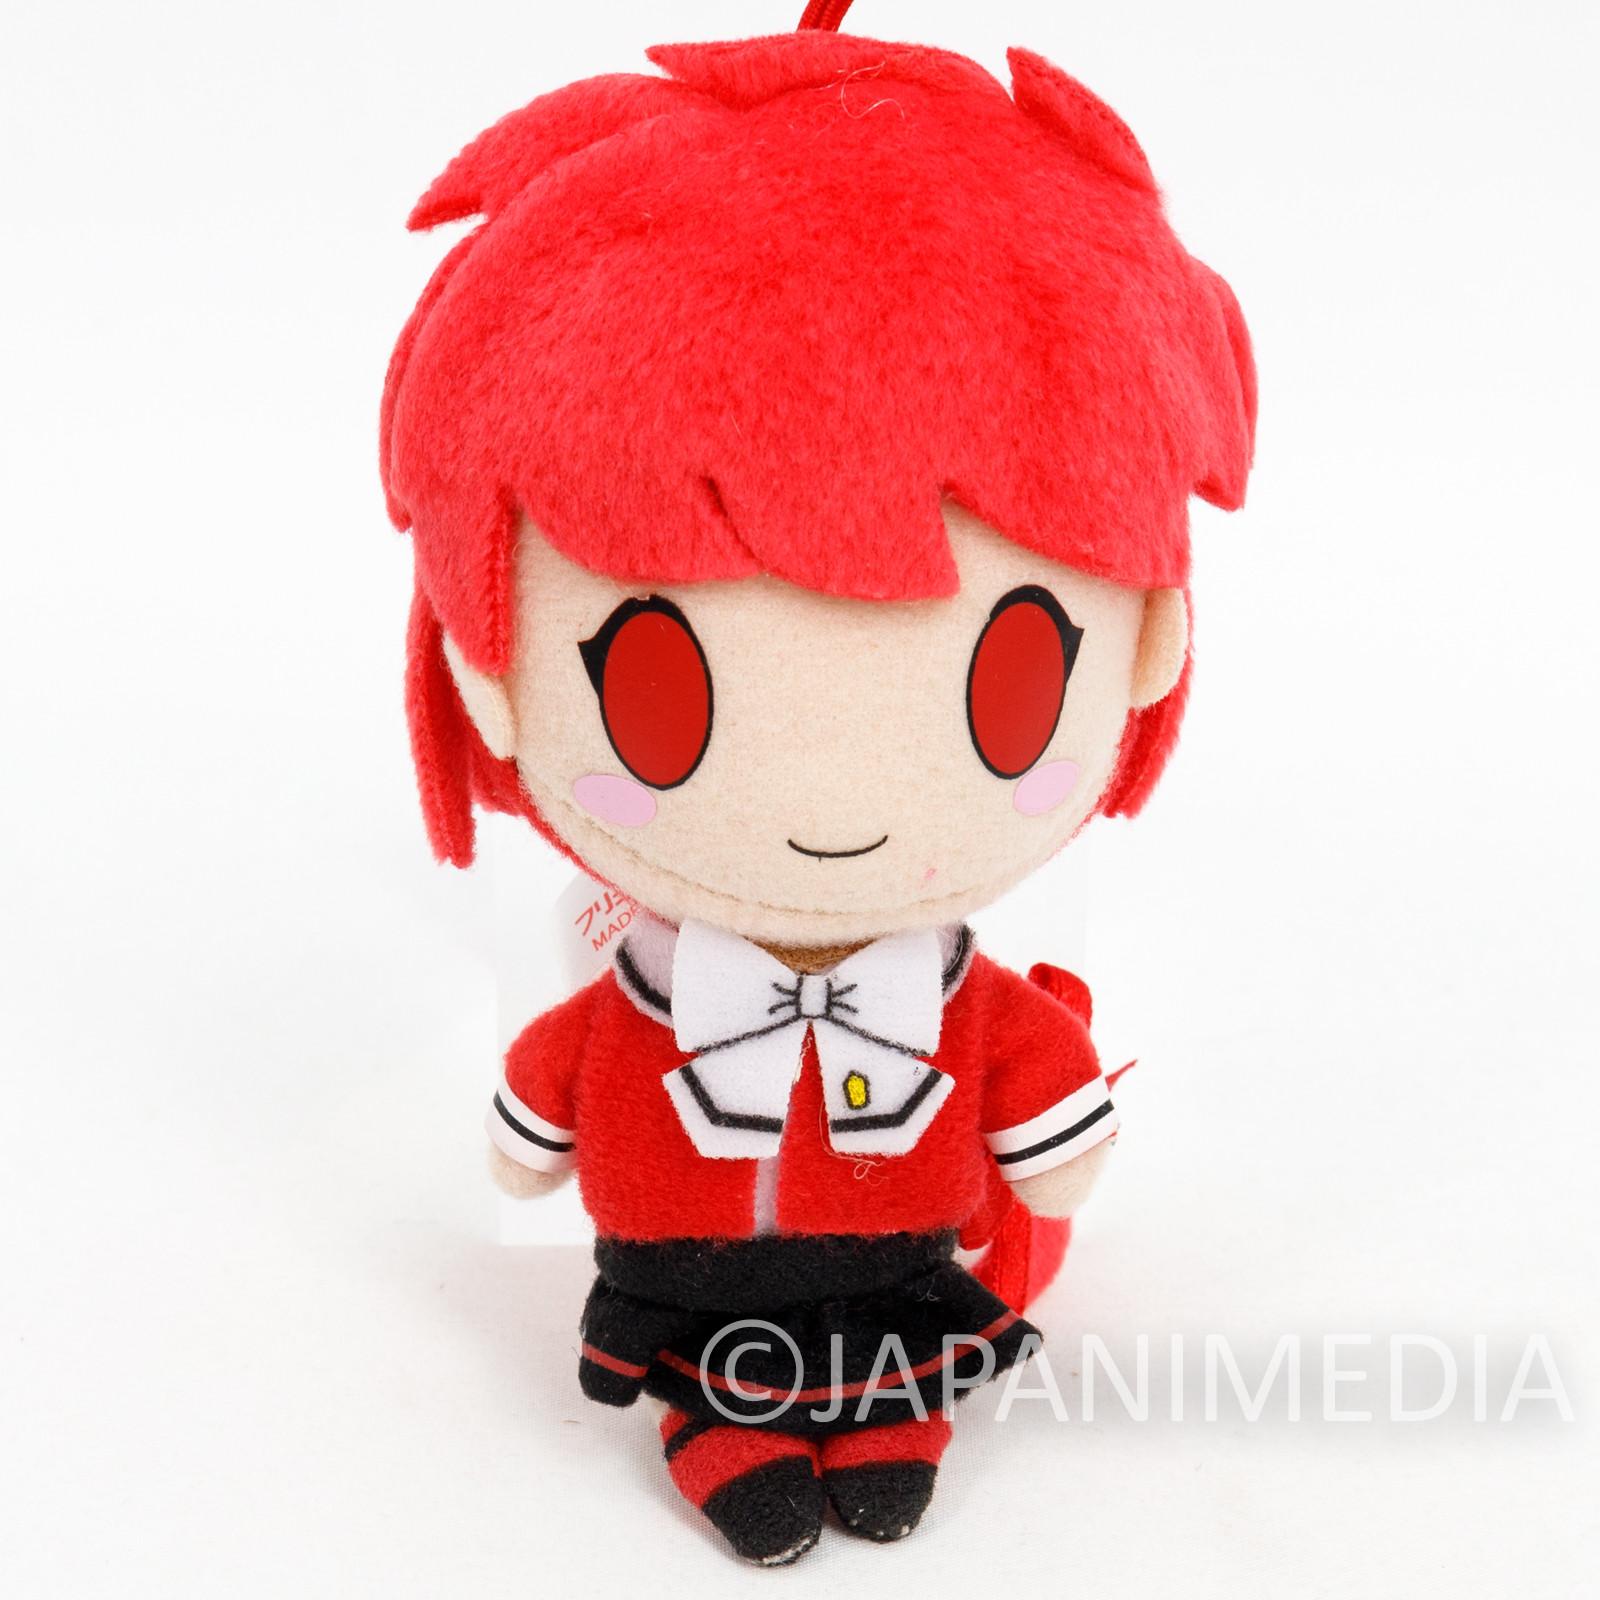 Magic Knight Rayearth Hikaru Shido Mascot Plush Doll CLAMP JAPAN